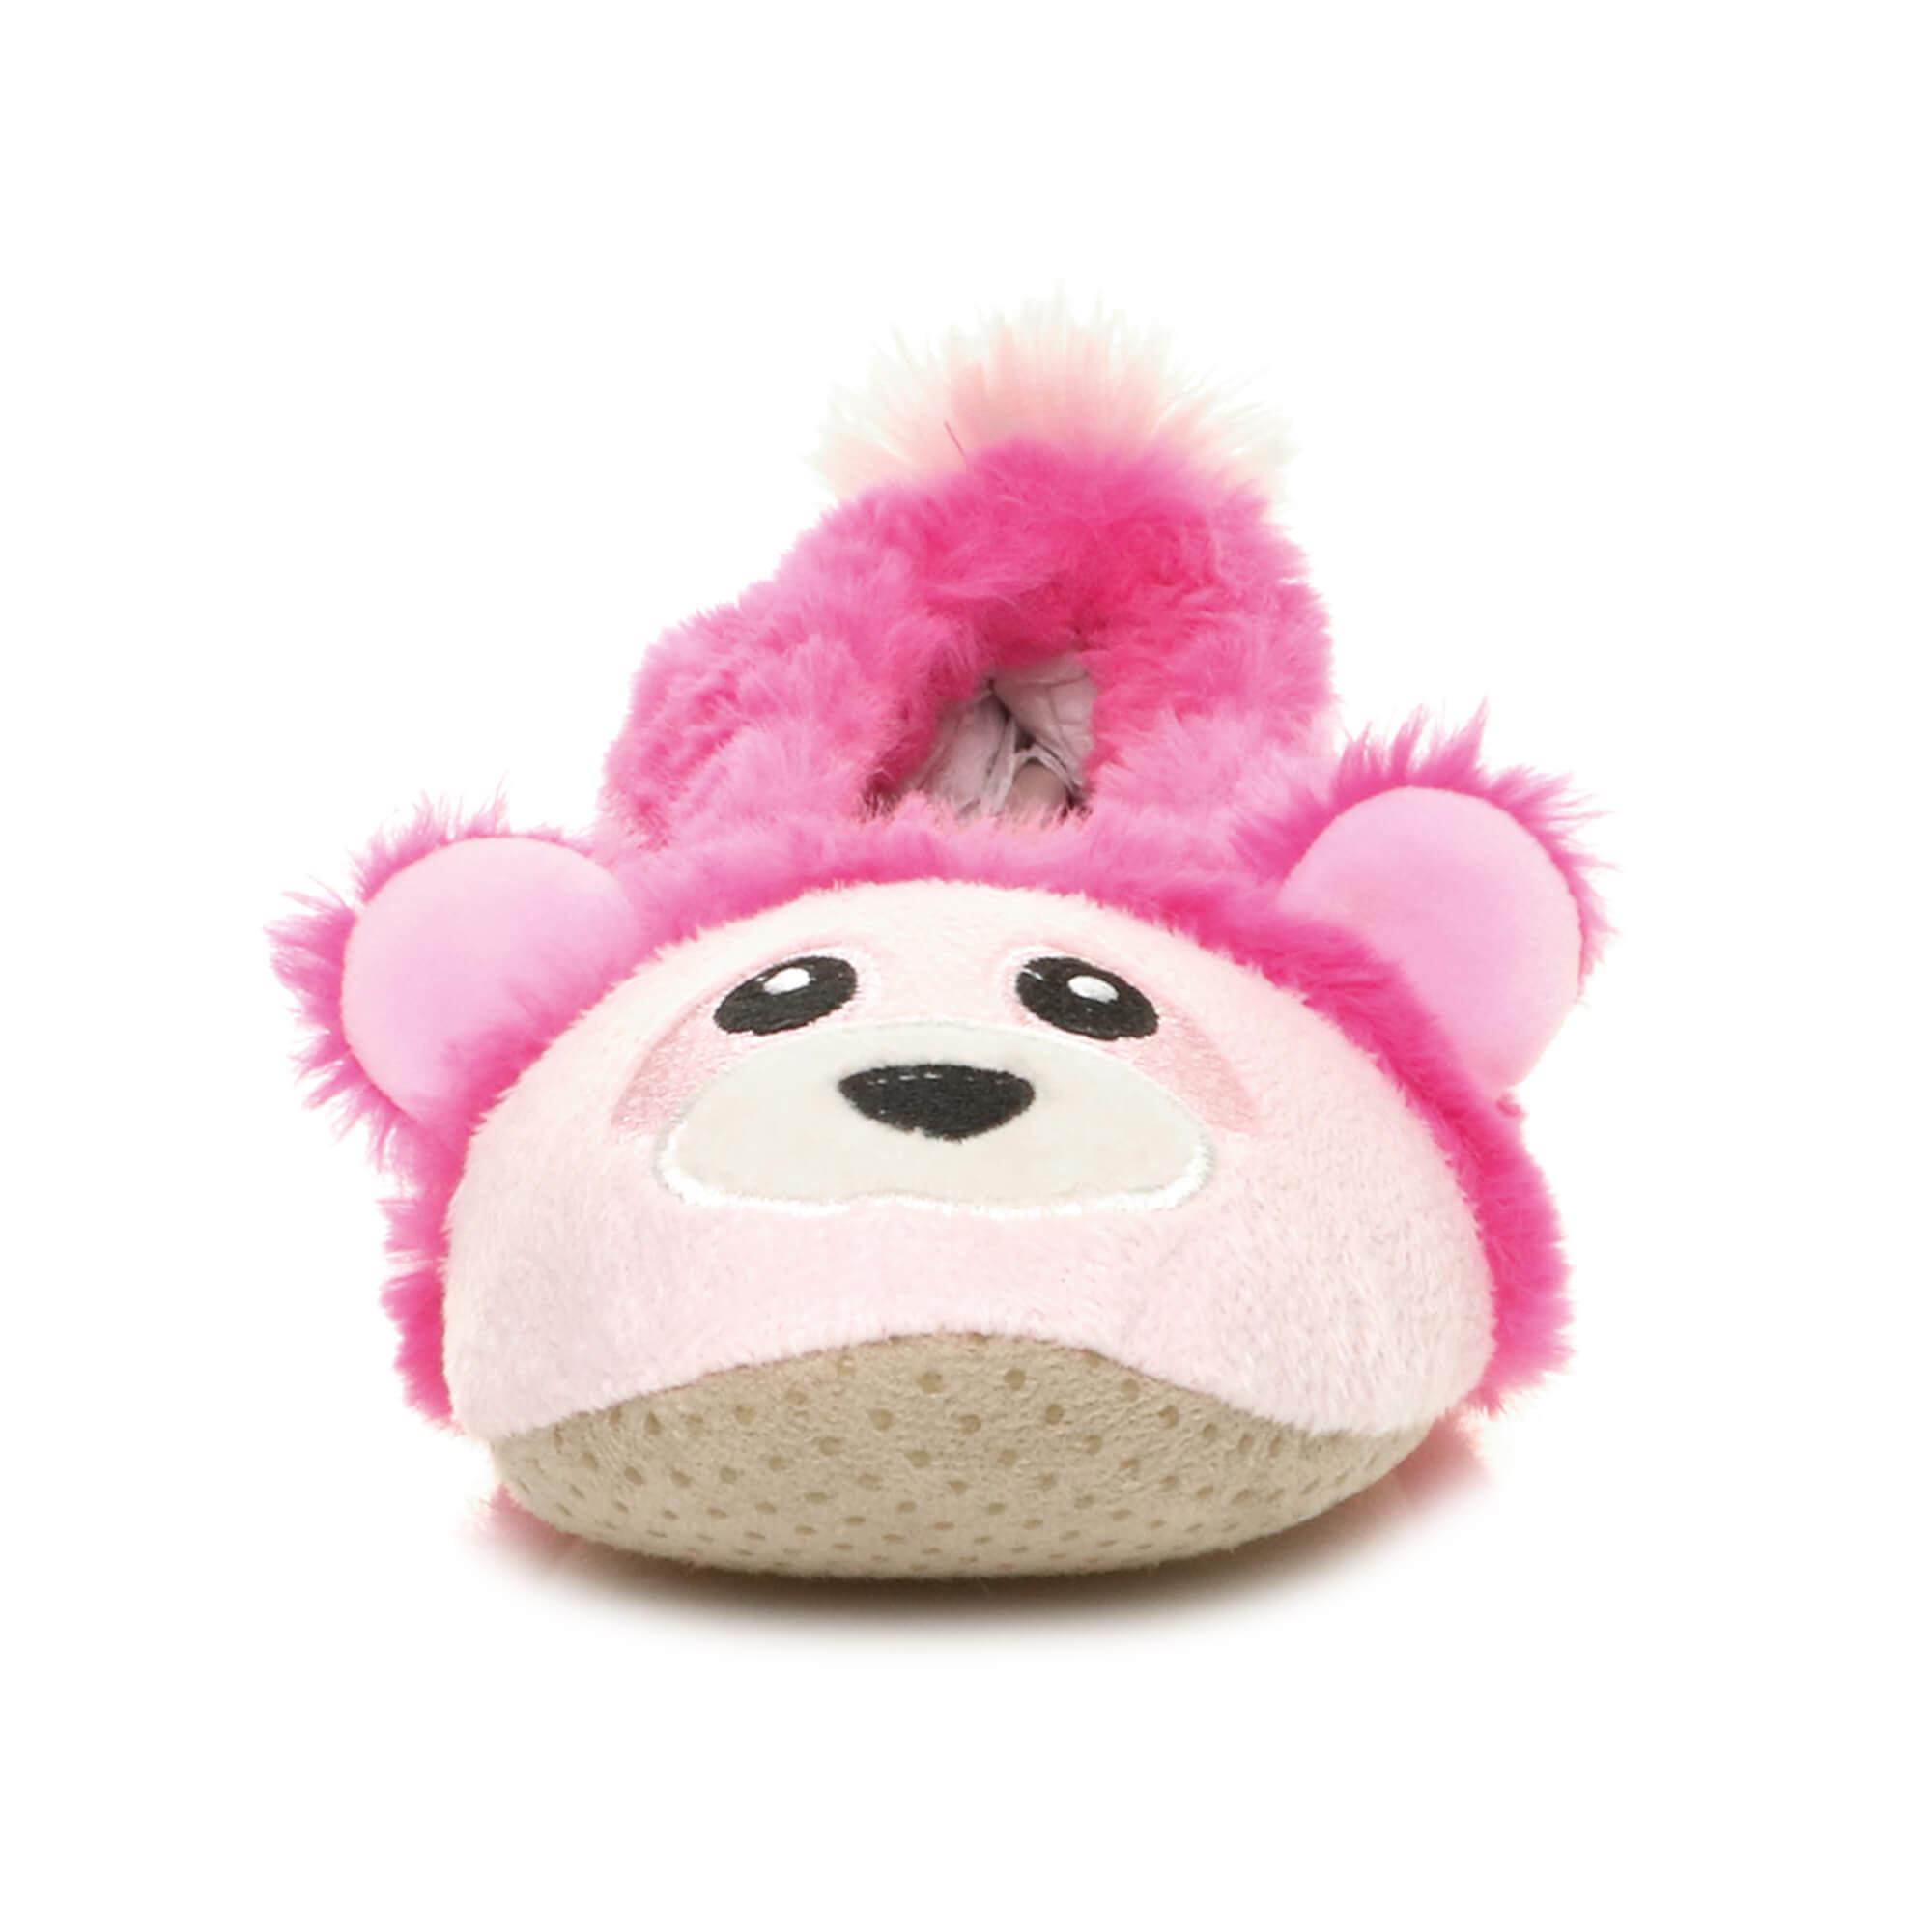 Womens-ladies-raccoon-bear-face-novelty-gift-elastic-slip-on-slippers-socks-size thumbnail 31